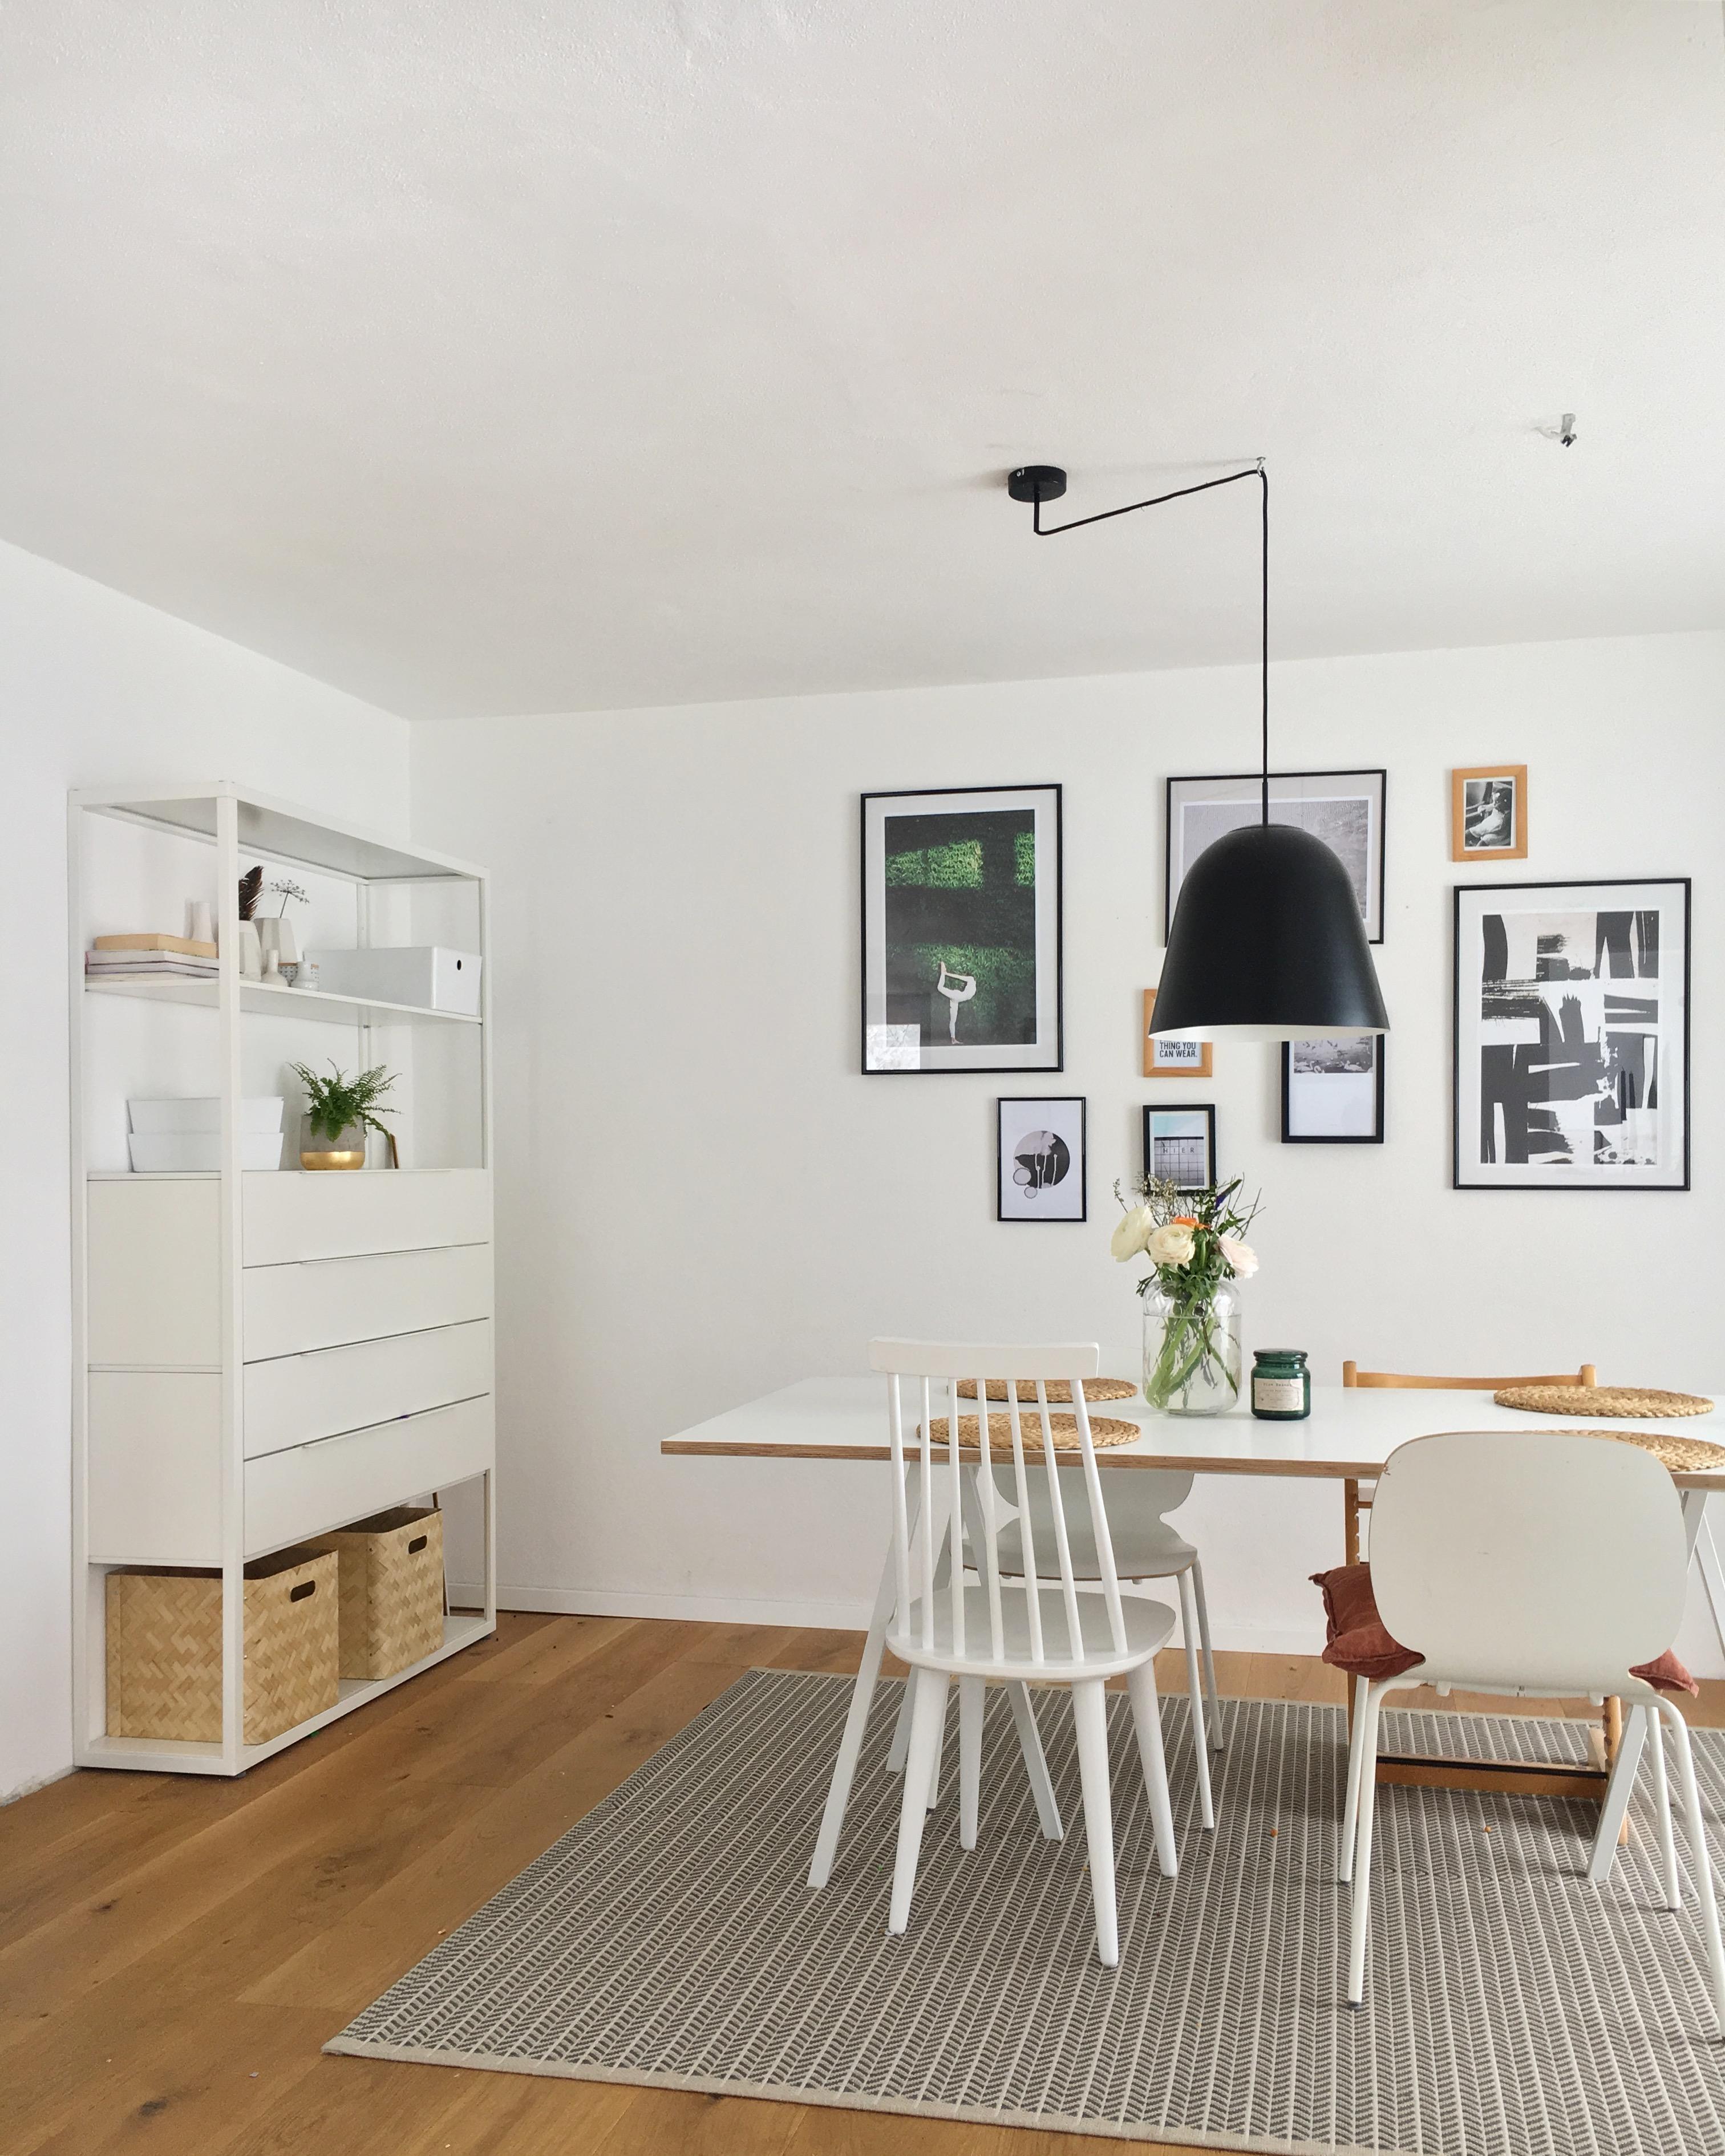 Regiestuhl Bilder Ideen Couch